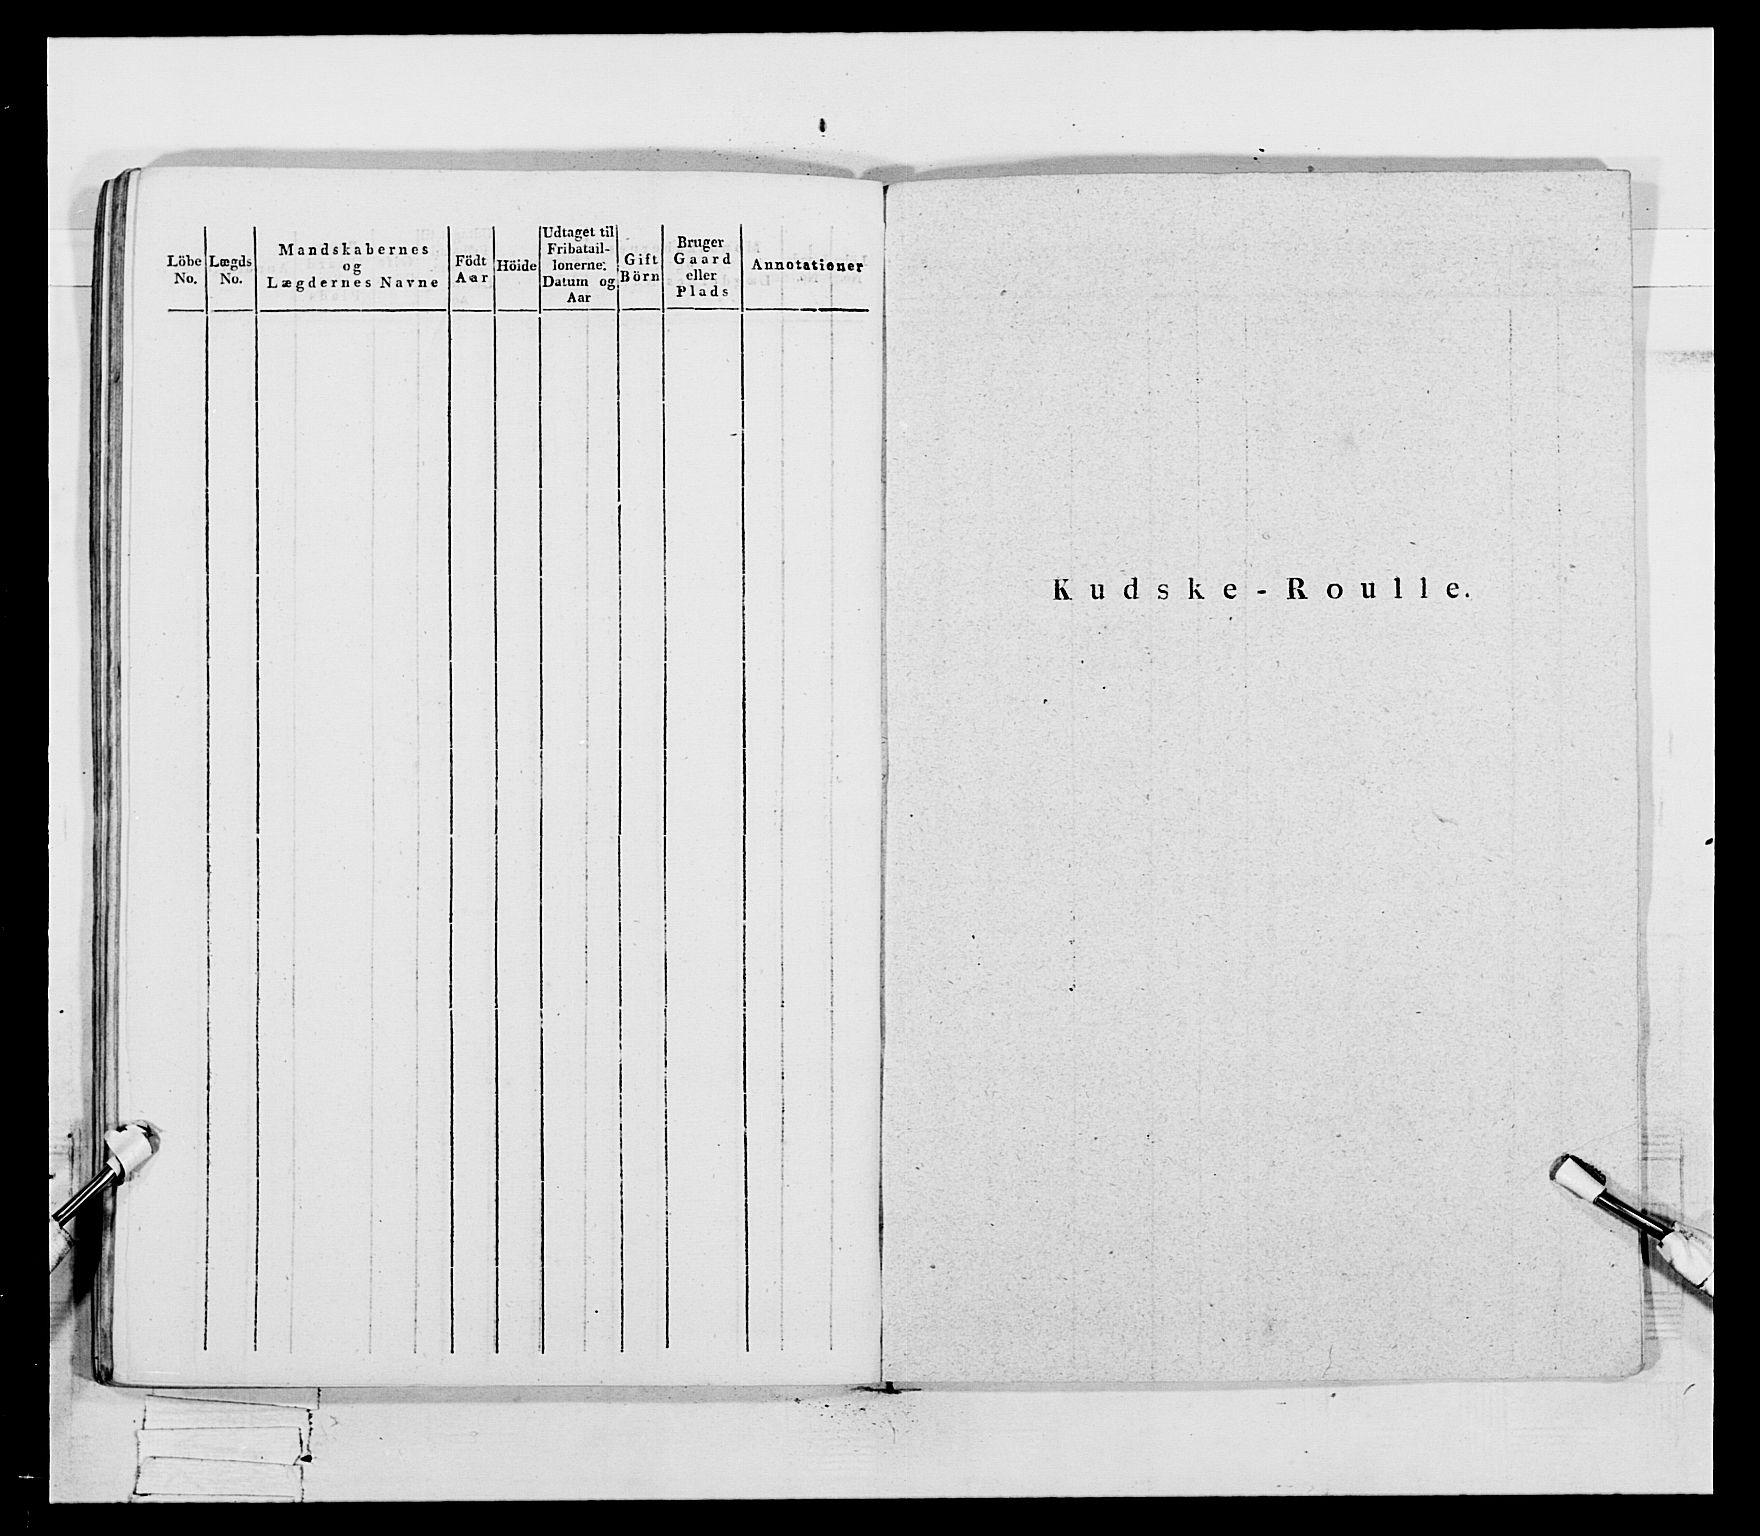 RA, Generalitets- og kommissariatskollegiet, Det kongelige norske kommissariatskollegium, E/Eh/L0069: Opplandske gevorbne infanteriregiment, 1810-1818, s. 704